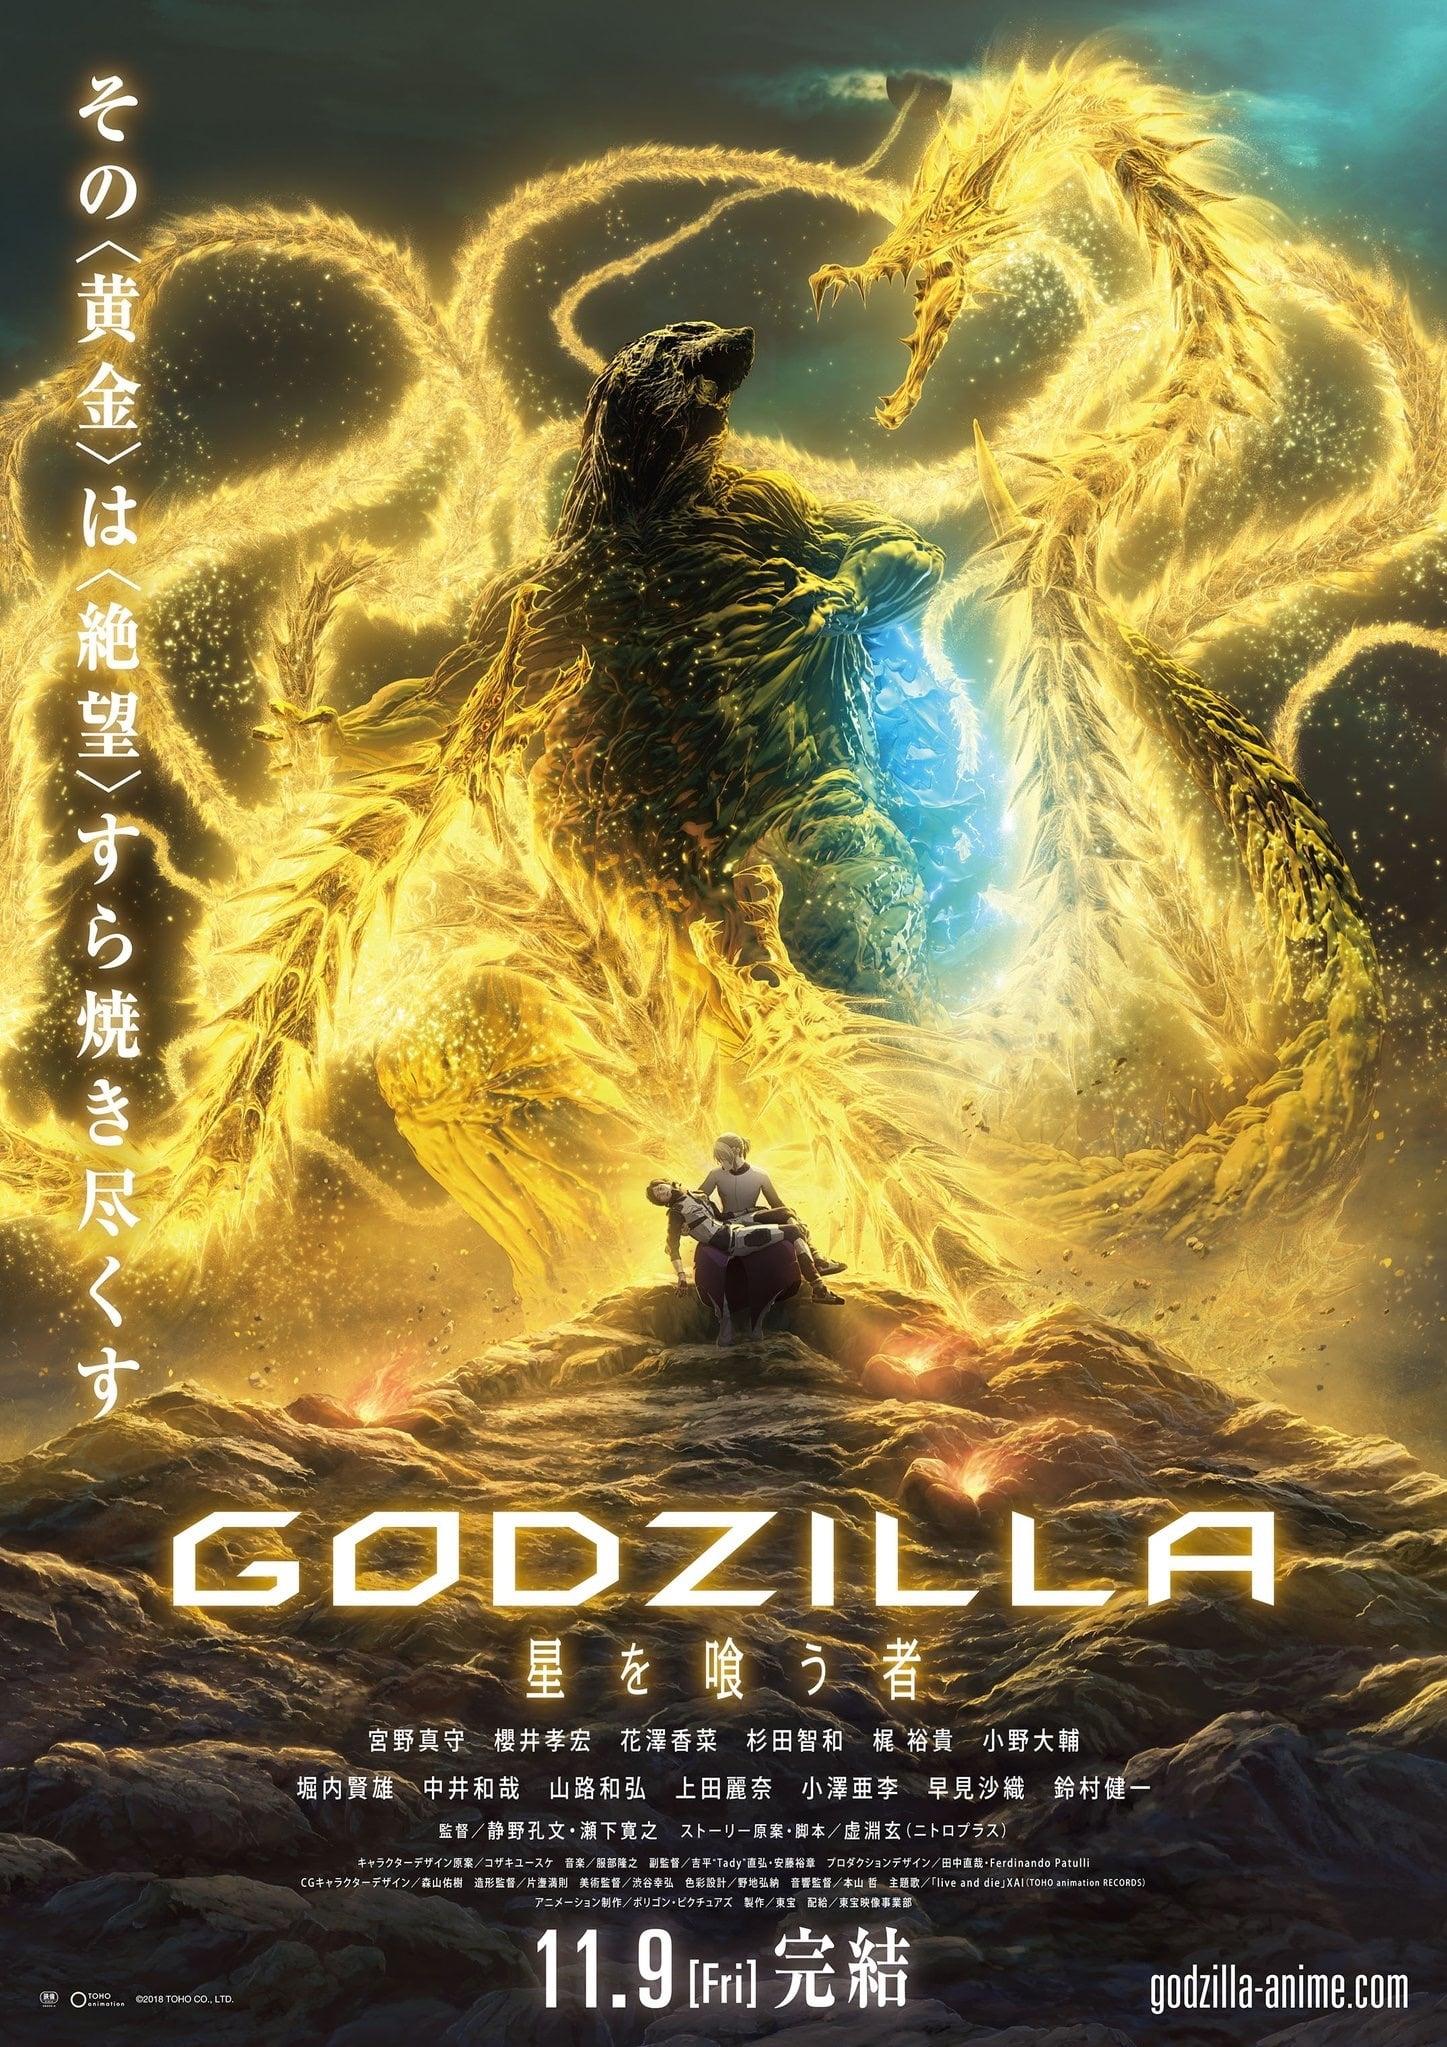 watch Godzilla: Eater of Stars 2018 online free